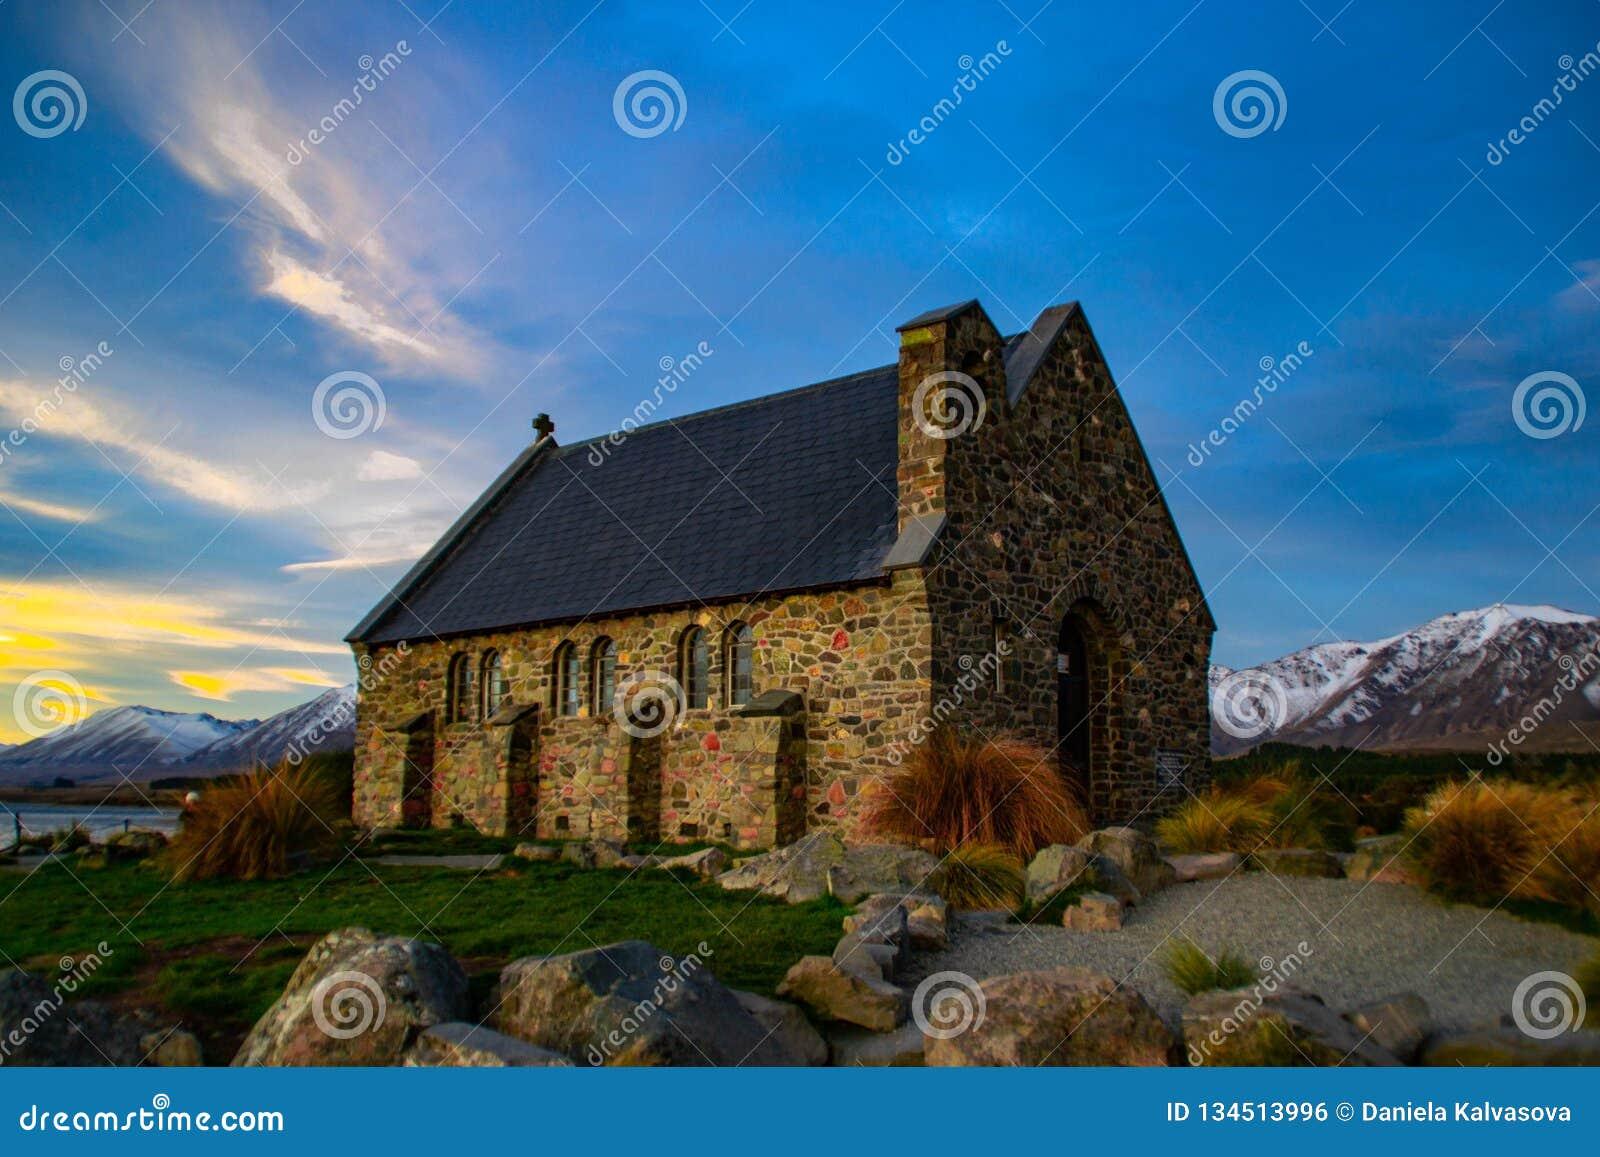 Church Of The Good Shepherd, New Zealand Stock Photo - Image